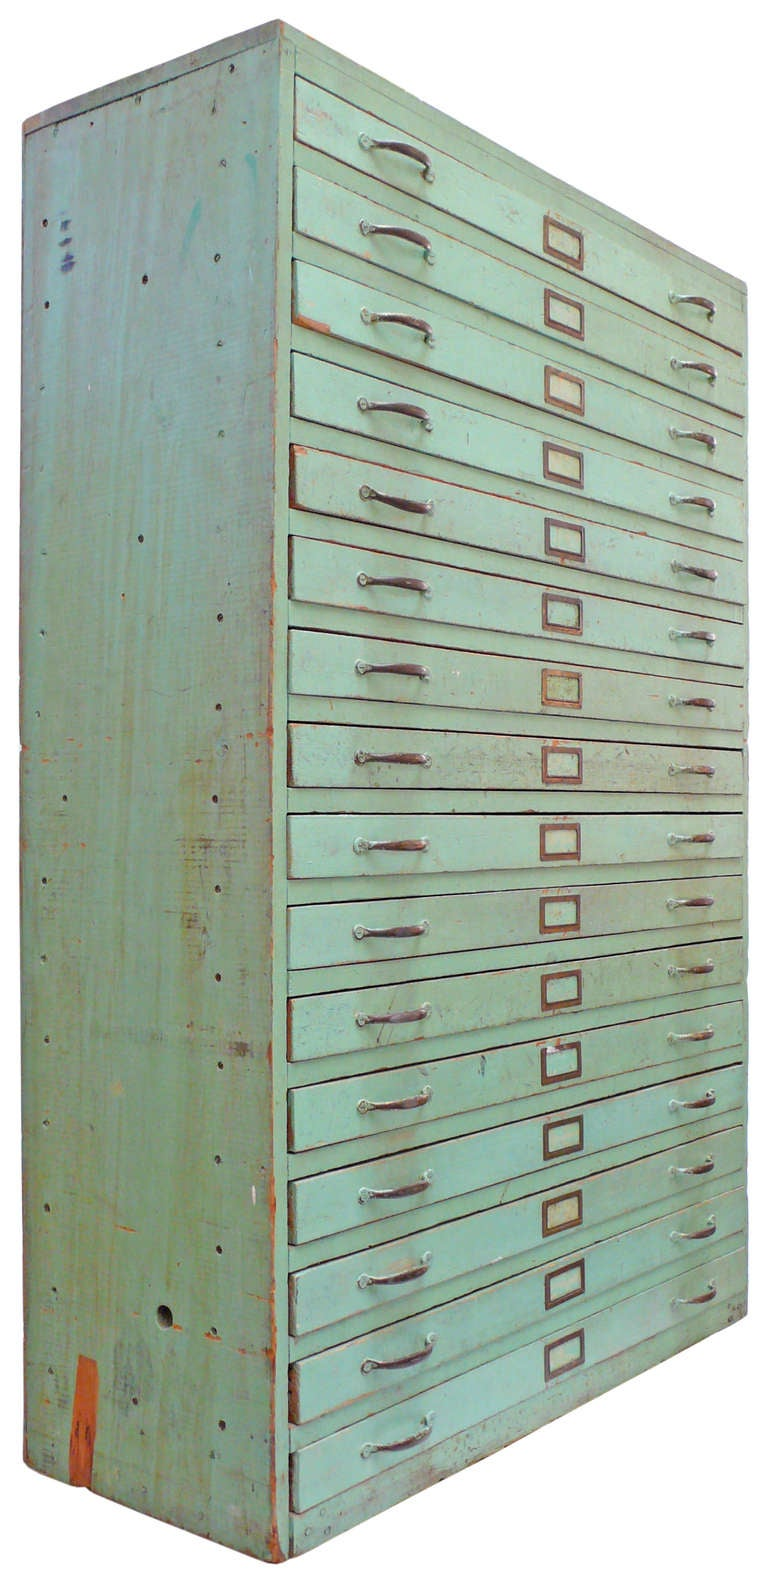 Vintage Green Flat File Storage Cabinet At 1stdibs